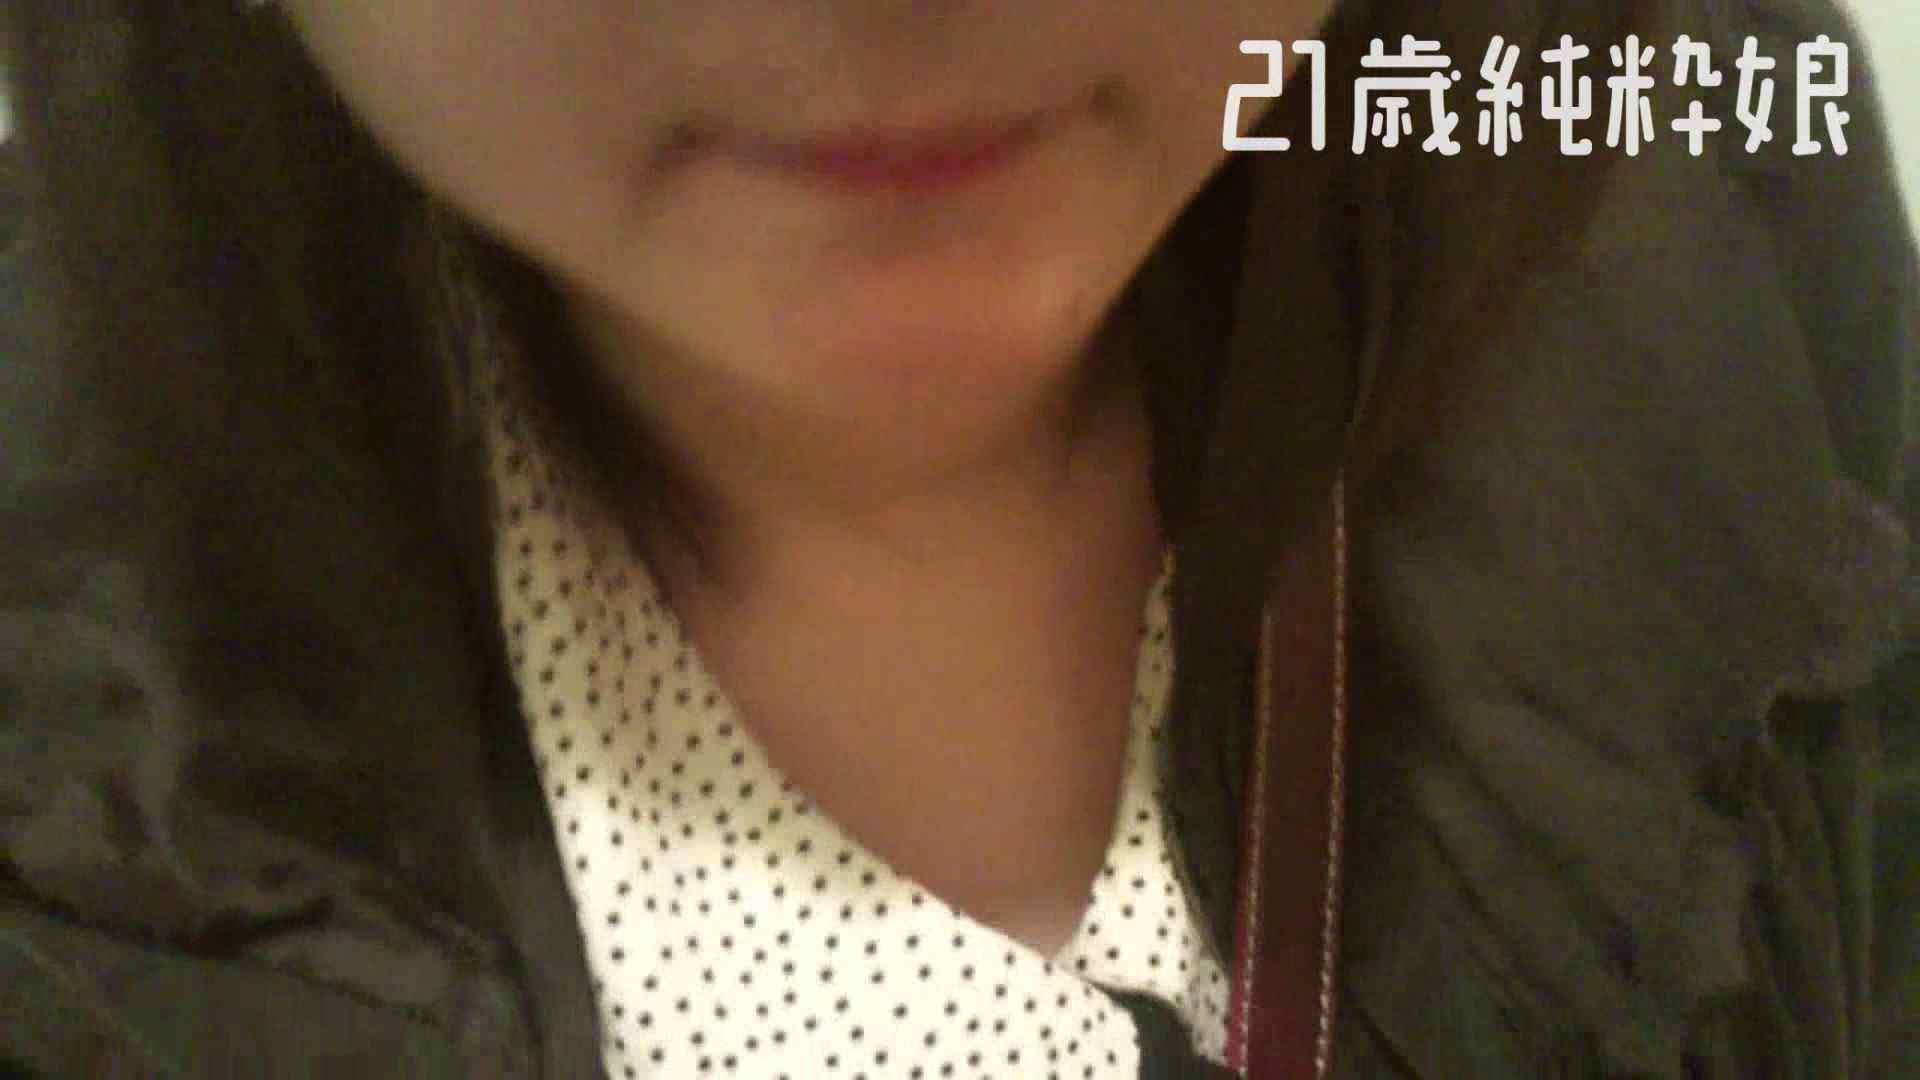 Gカップ21歳純粋嬢第2弾Vol.5 学校 オメコ動画キャプチャ 77pic 65